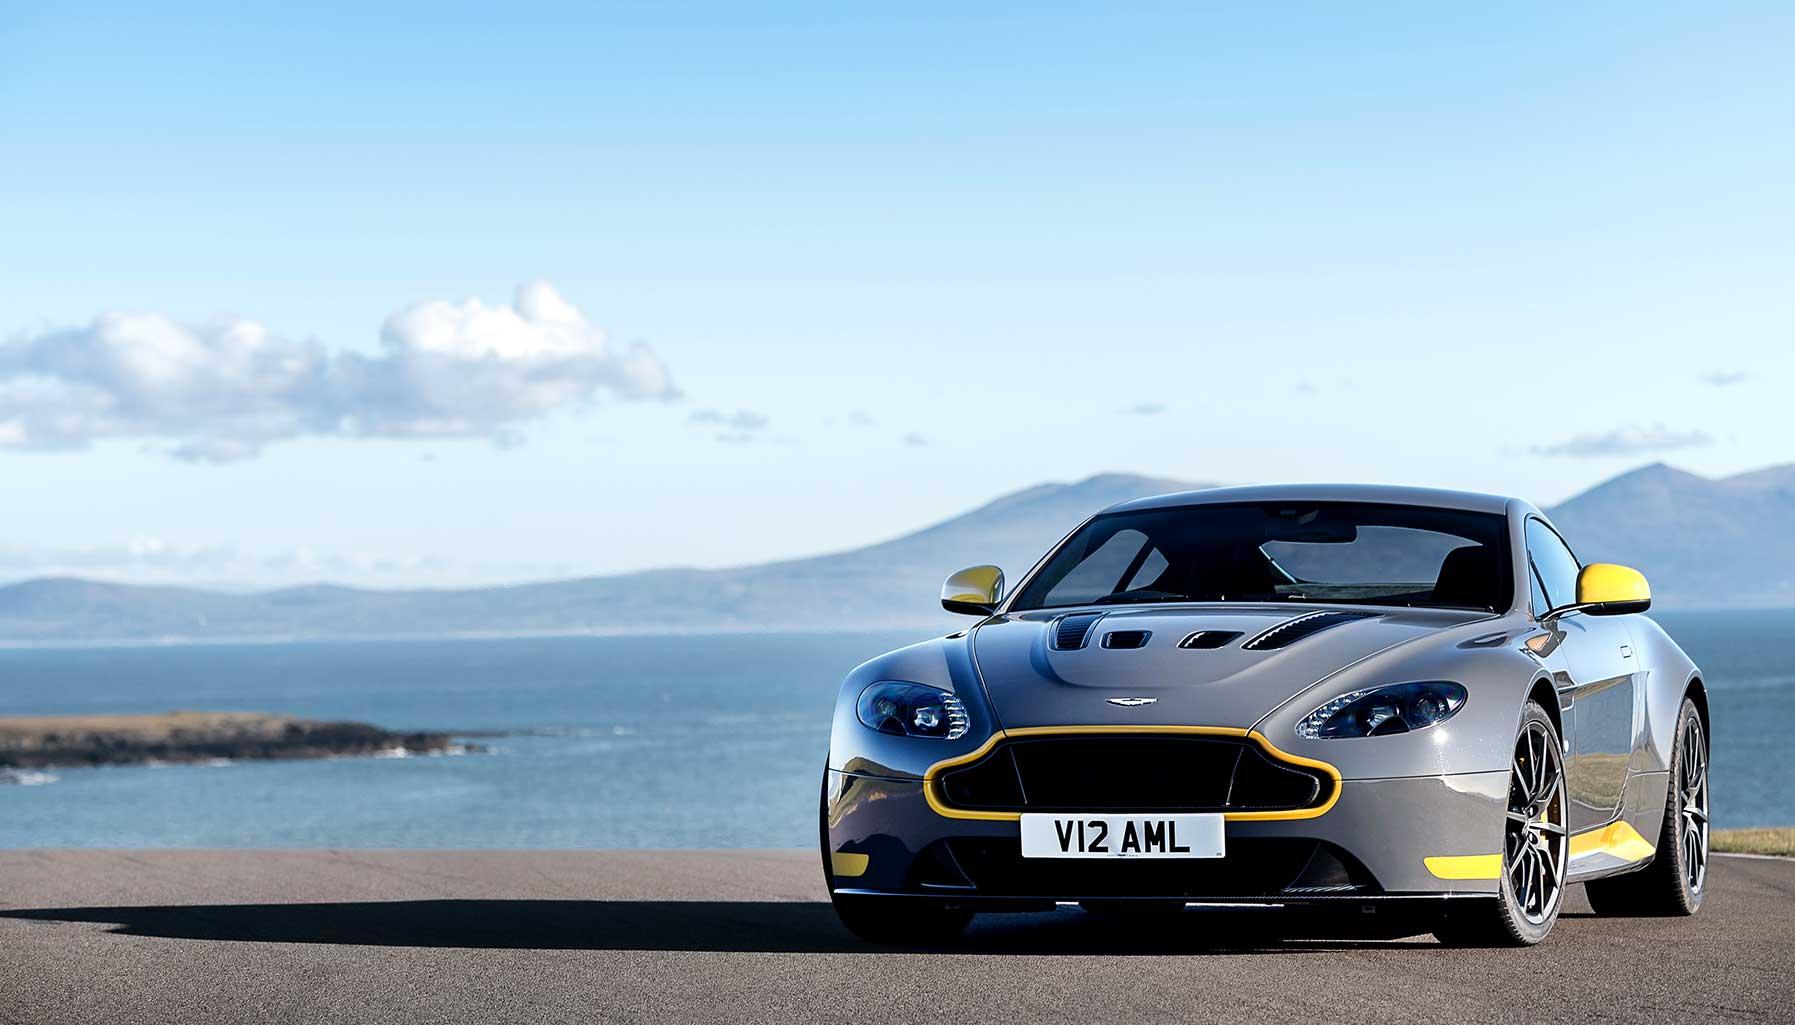 Sports Cars, Aston Martin V12 Vantage